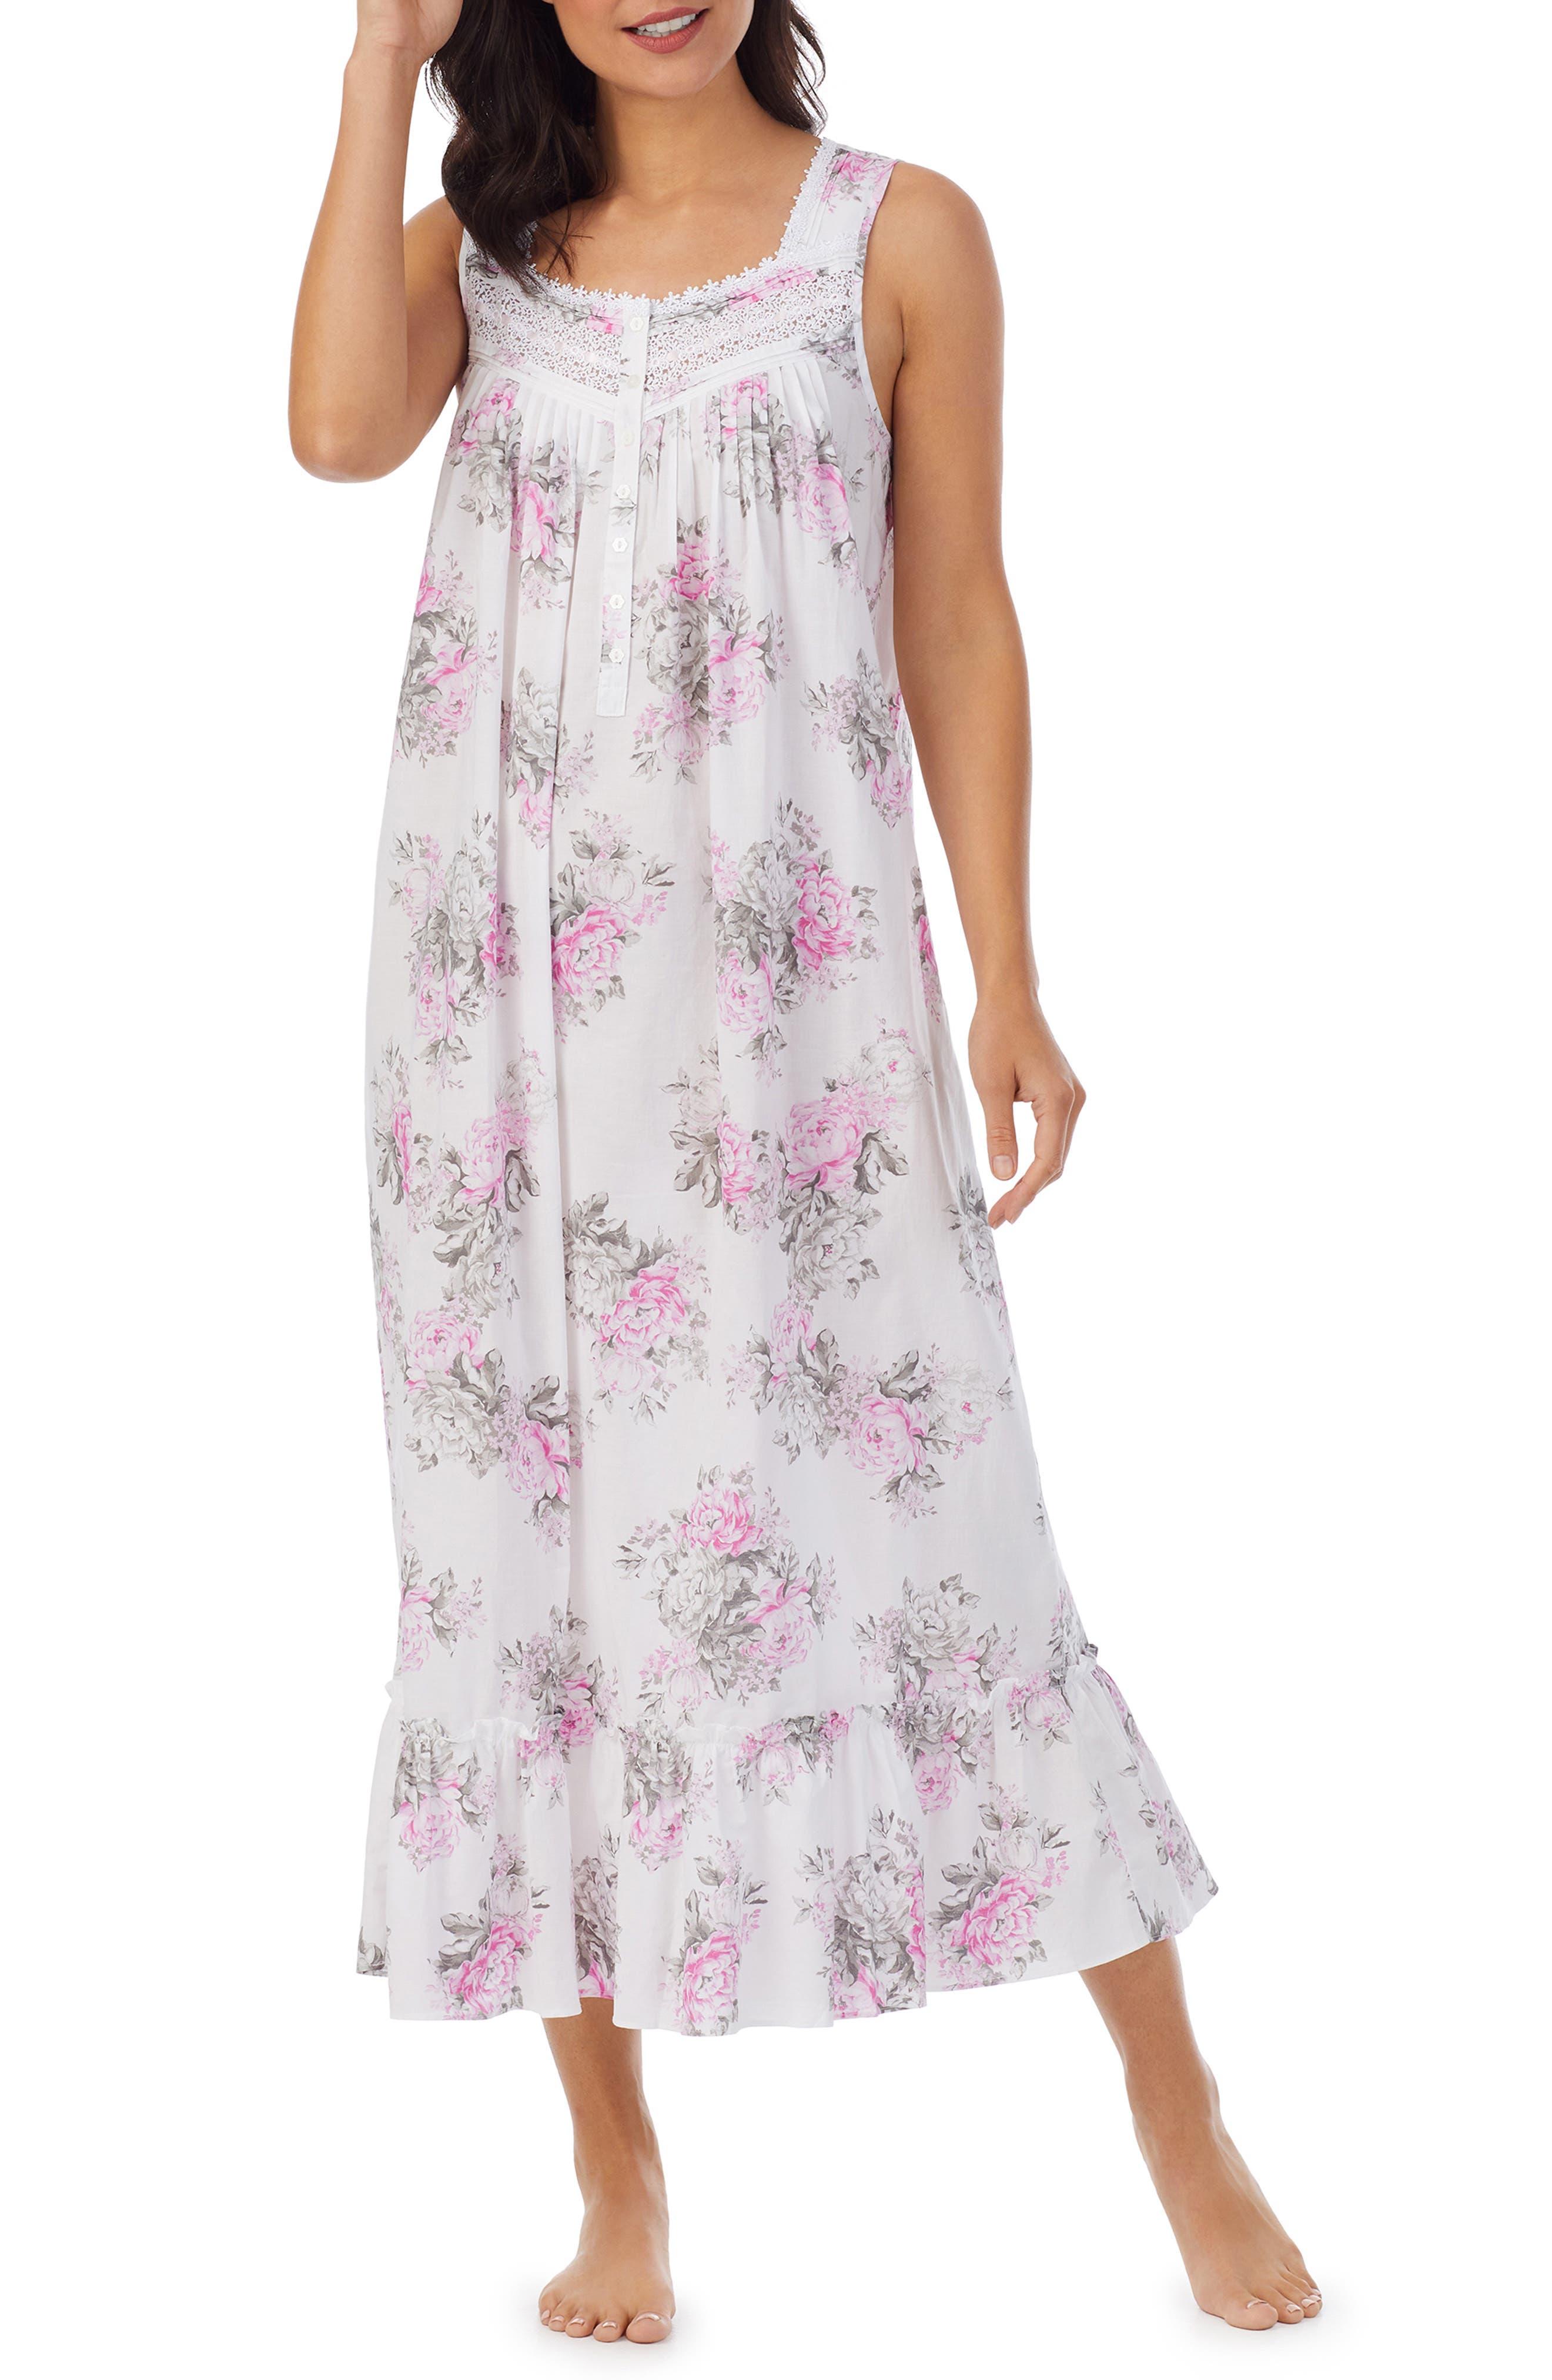 Floral Cotton Ballet Nightgown